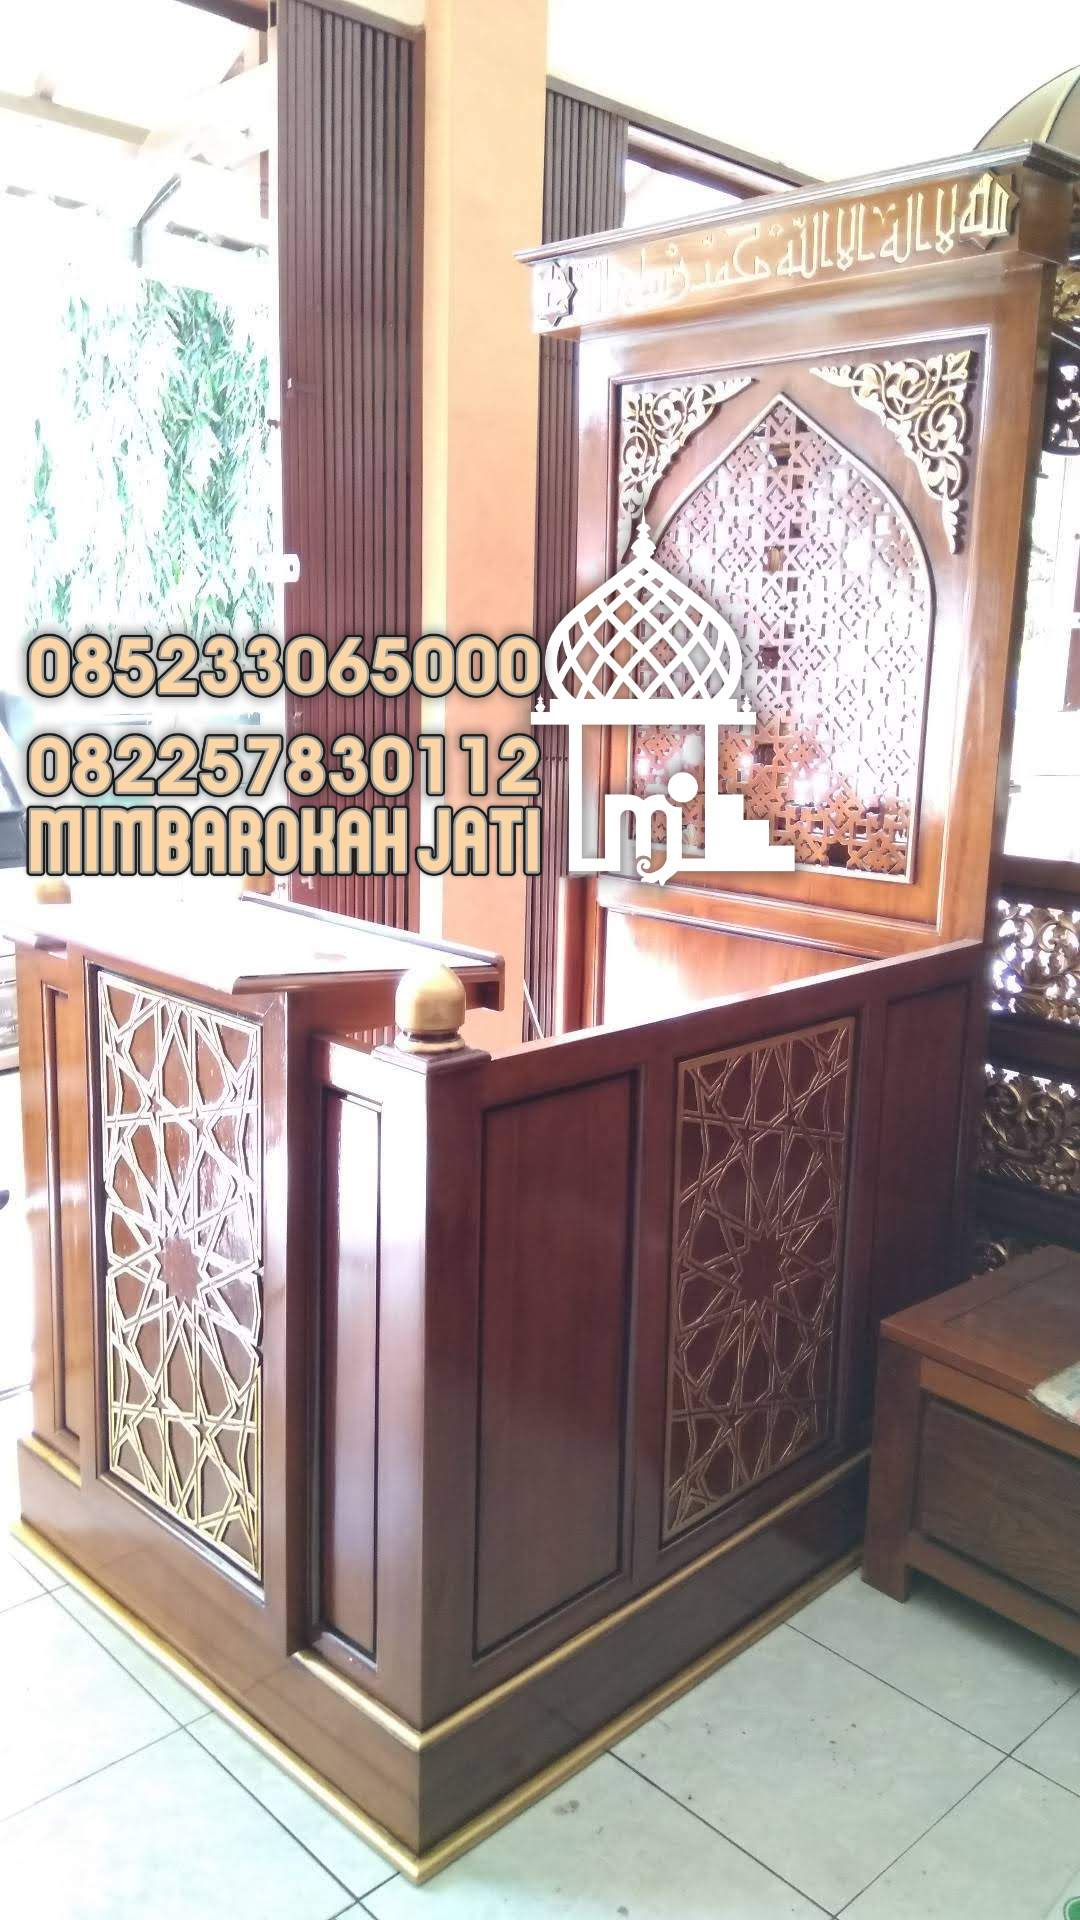 Mimbar Jepara Ornamen CNC Masjid Daerah Pontianak